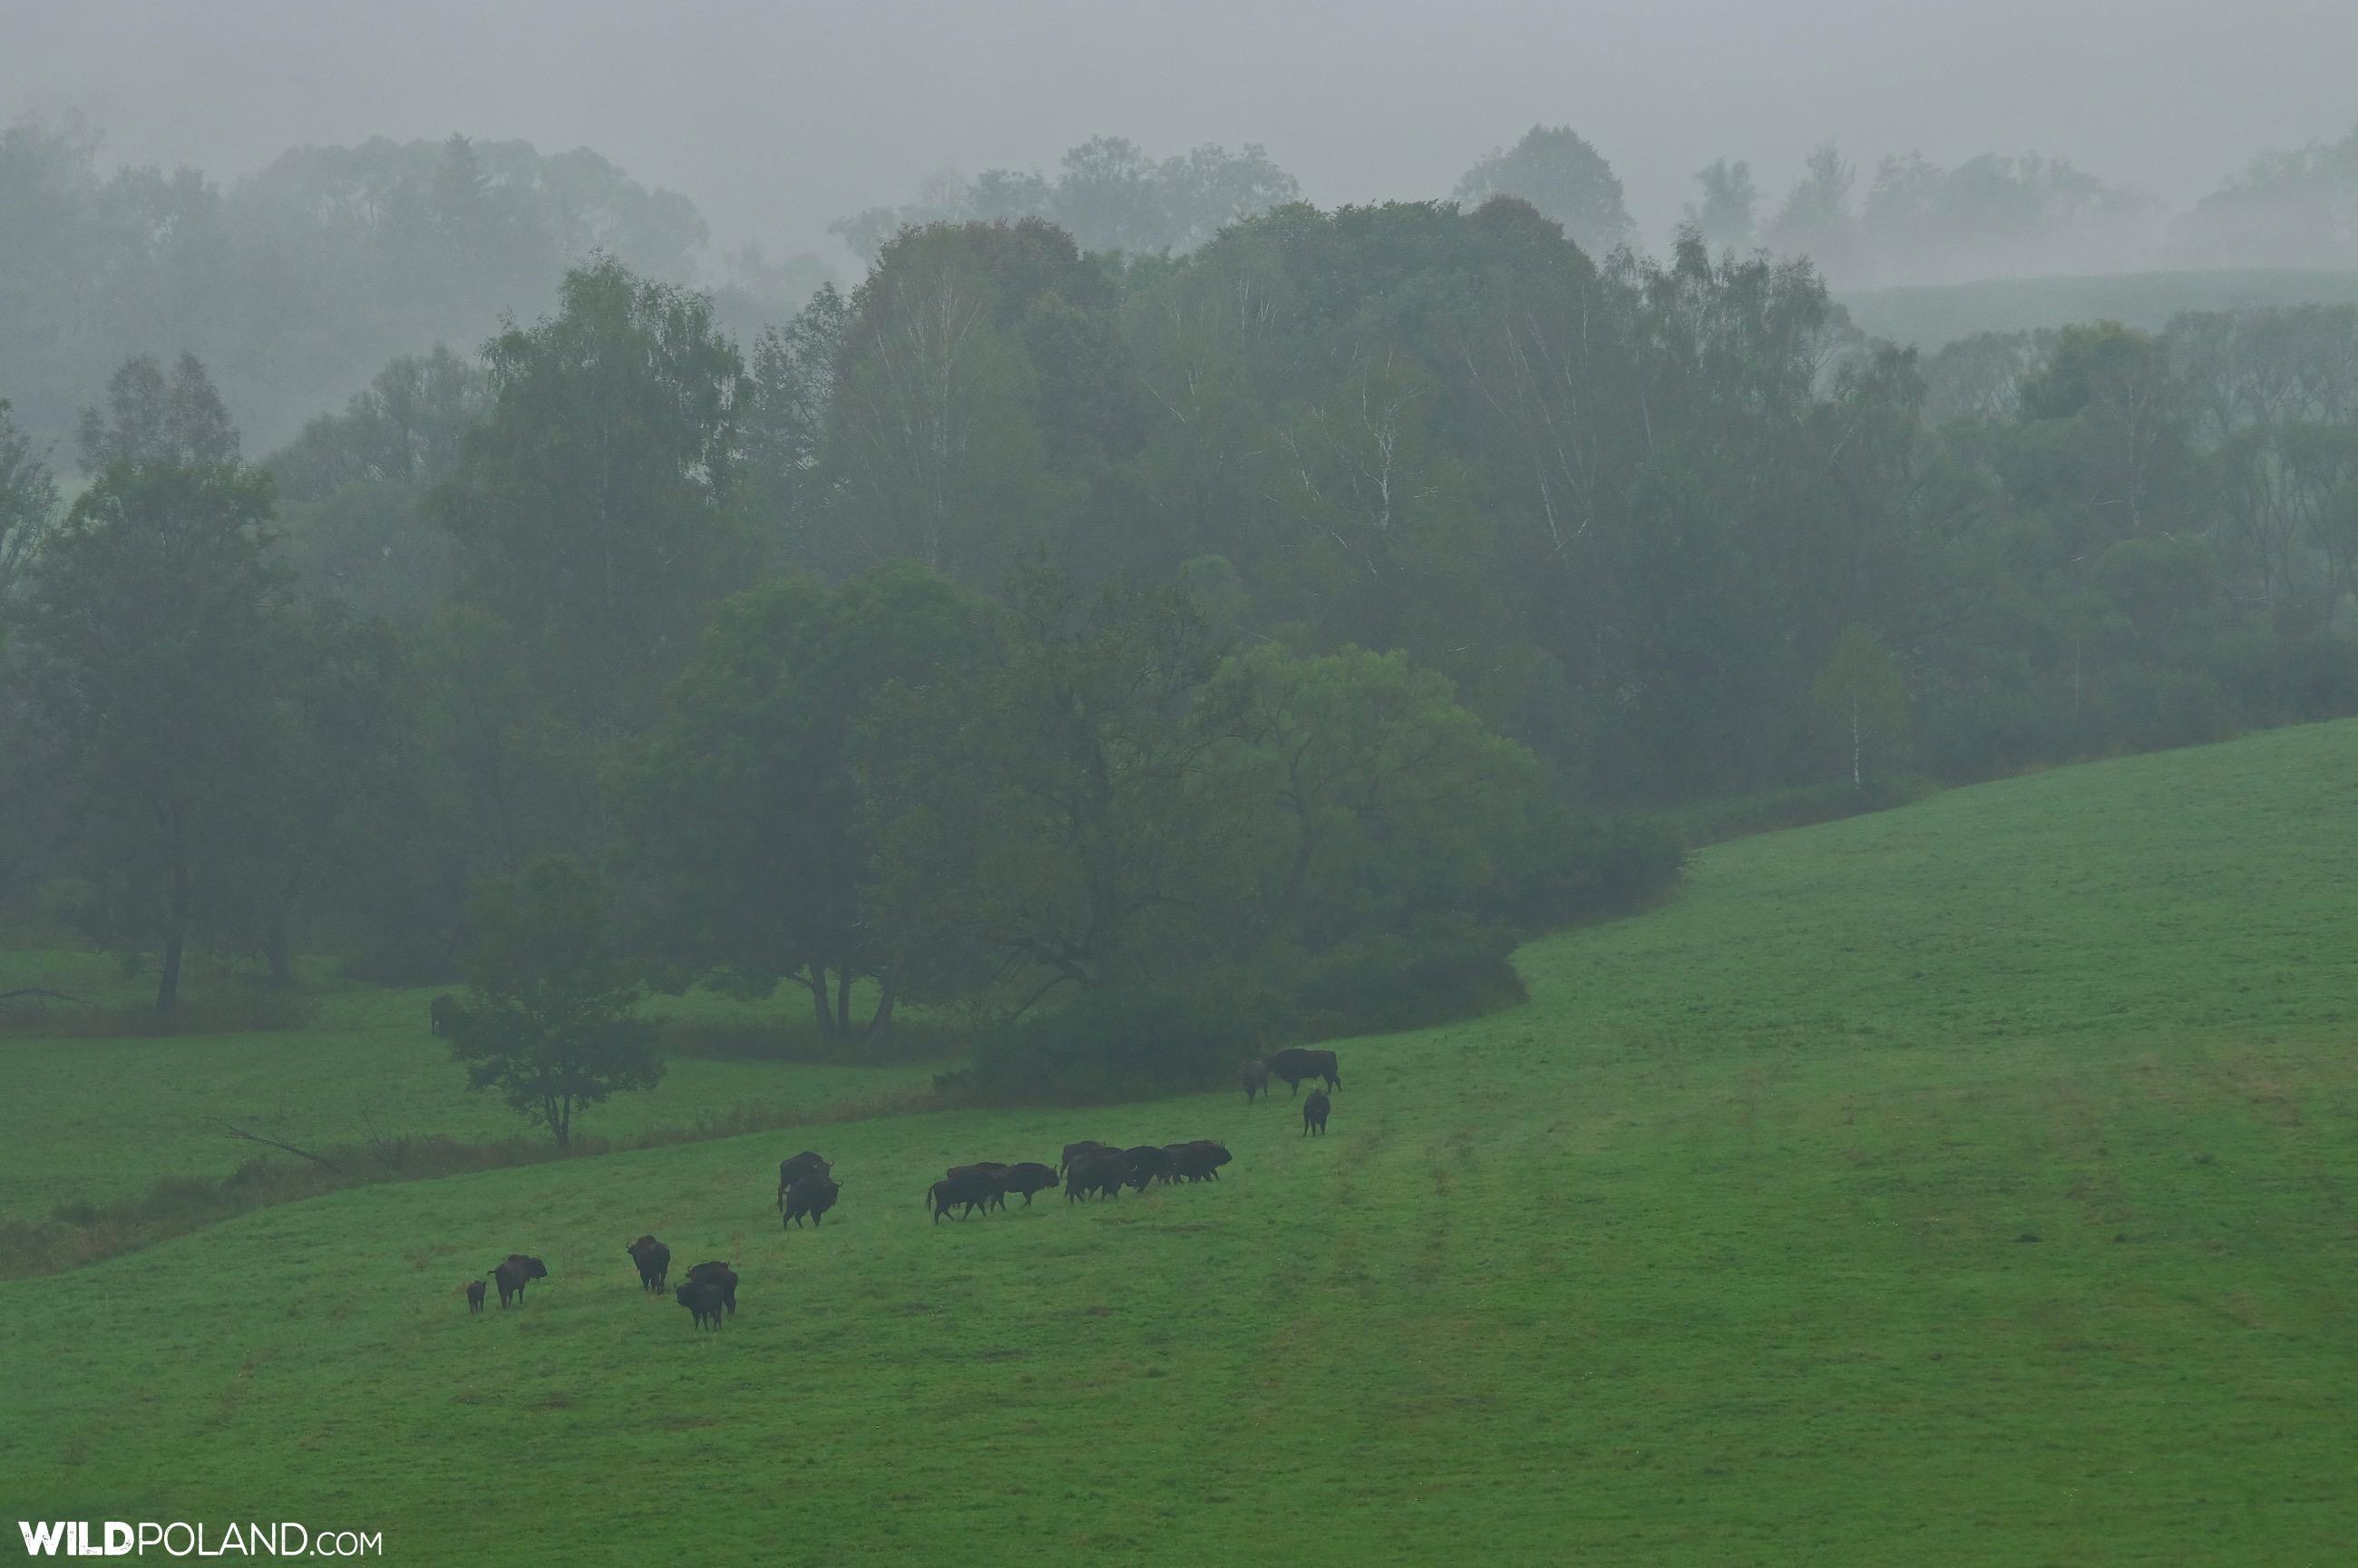 European Bison at dawn in the Bieszczady Mts, Eastern Carpathians